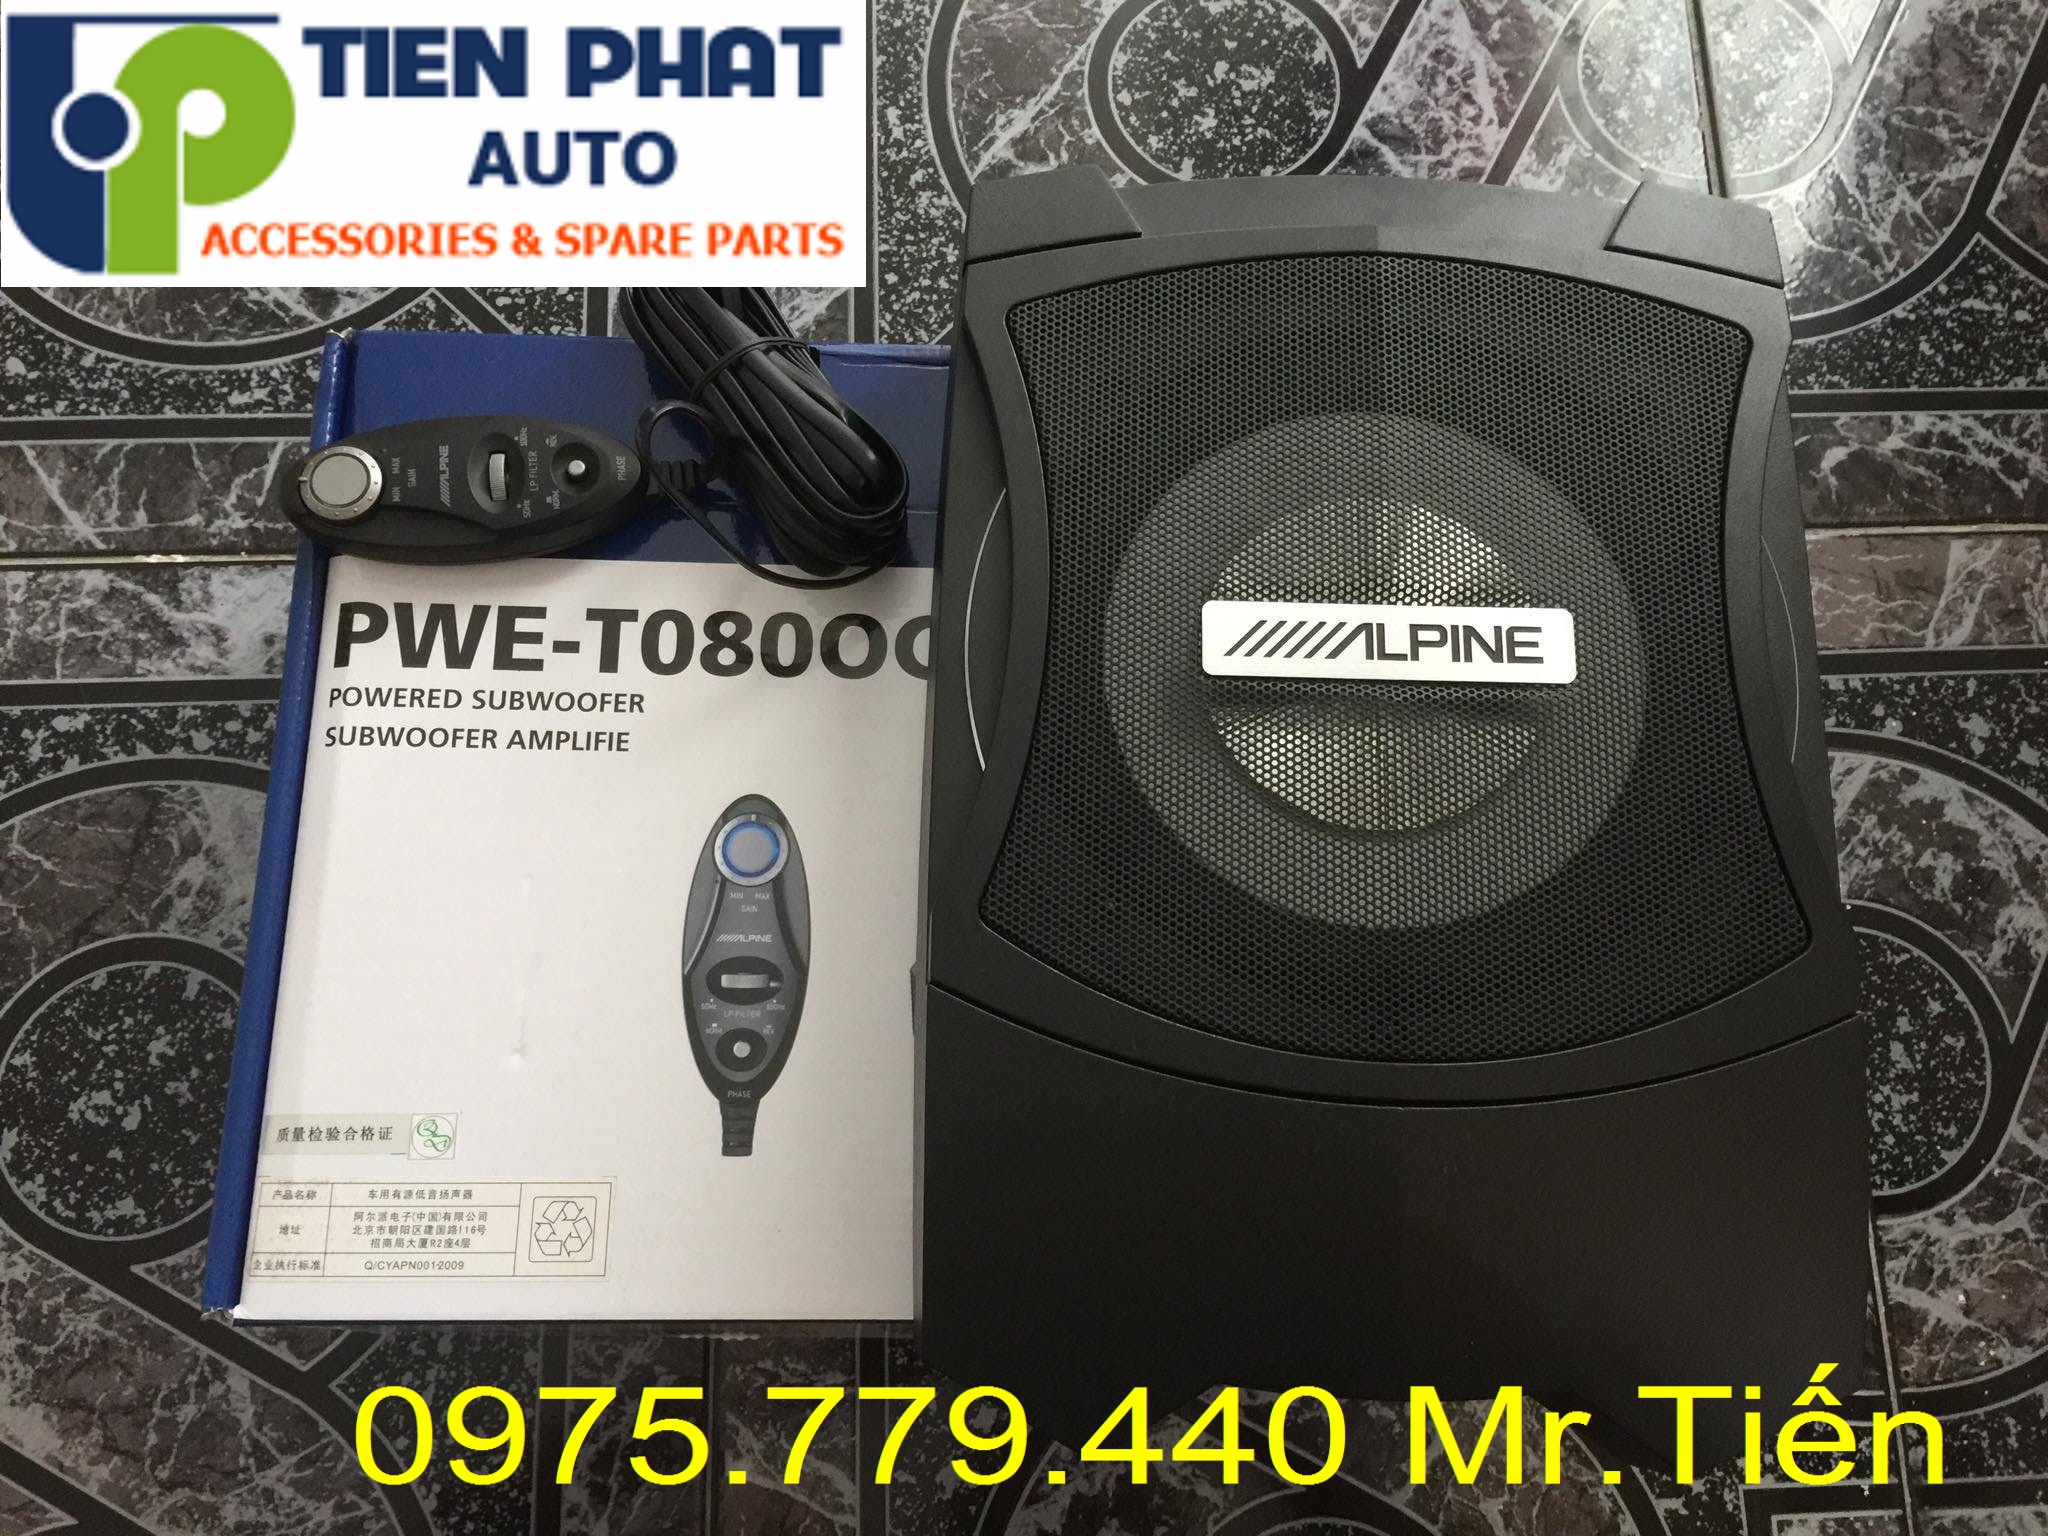 Lắp Loa sub Alpine PWE-T0800C cho Ford Ecape Lắp Đặt Tận Nơi